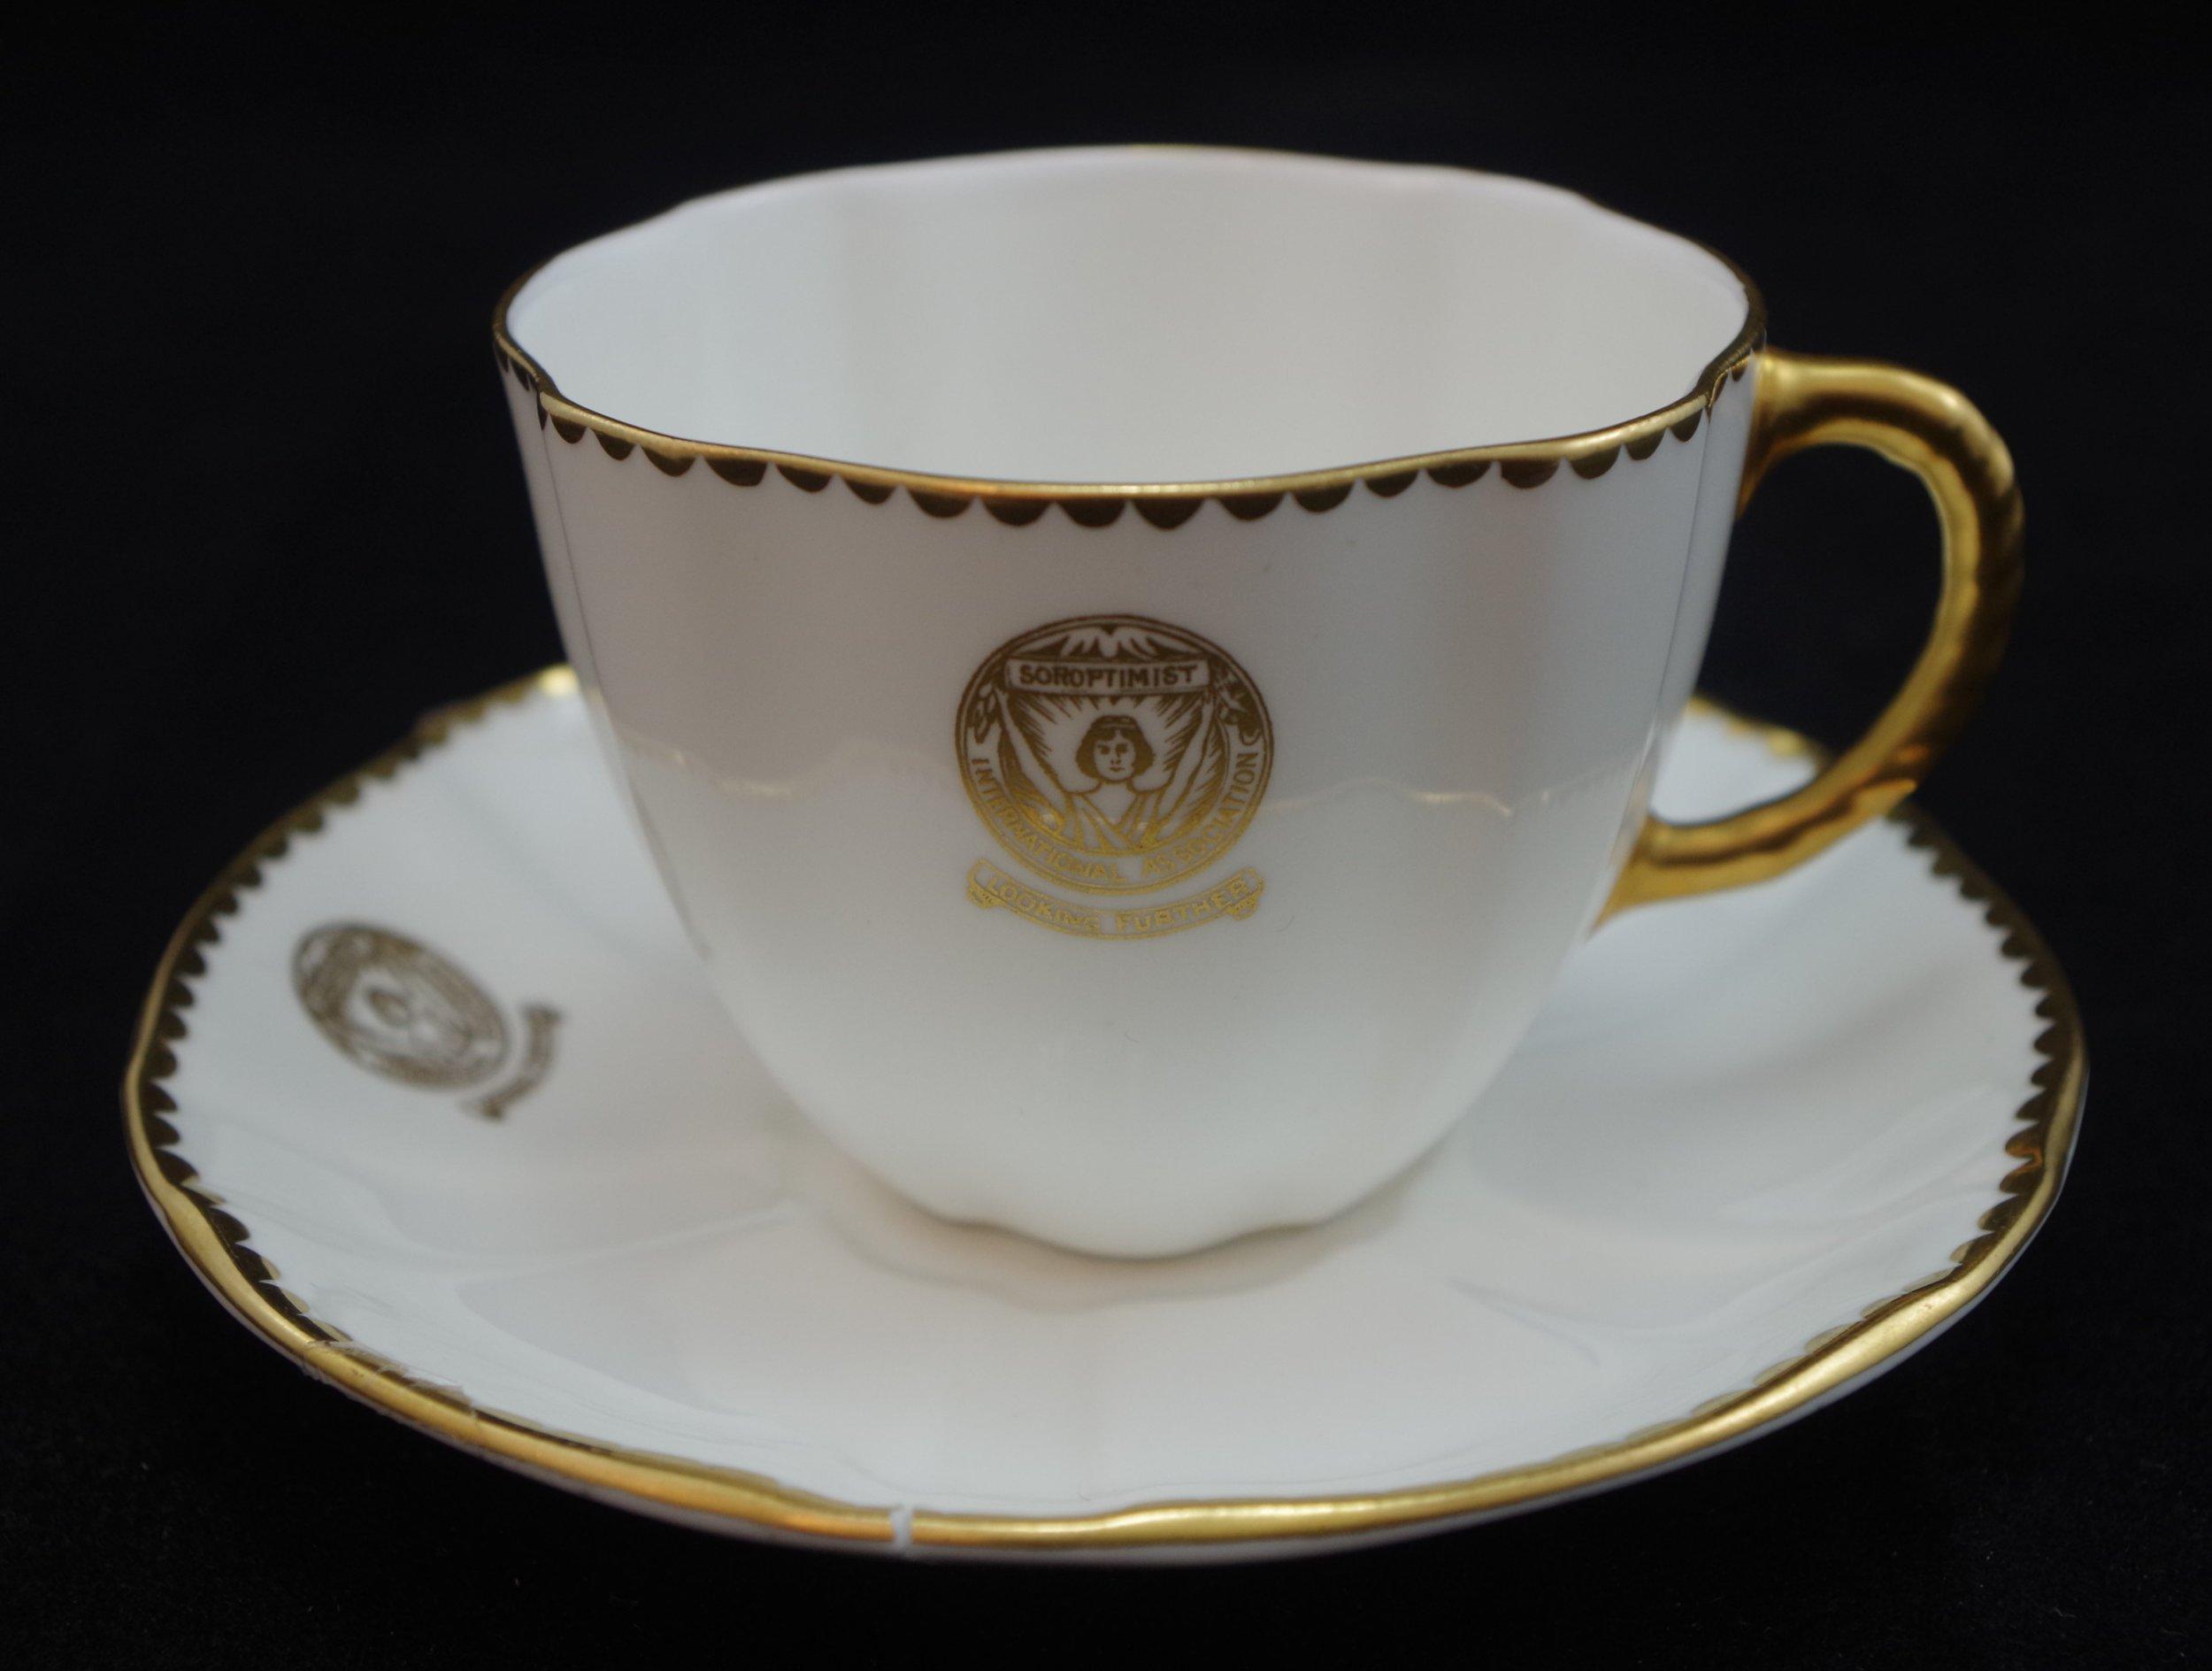 royal-crown-derby-surrey-soroptimist-international-association